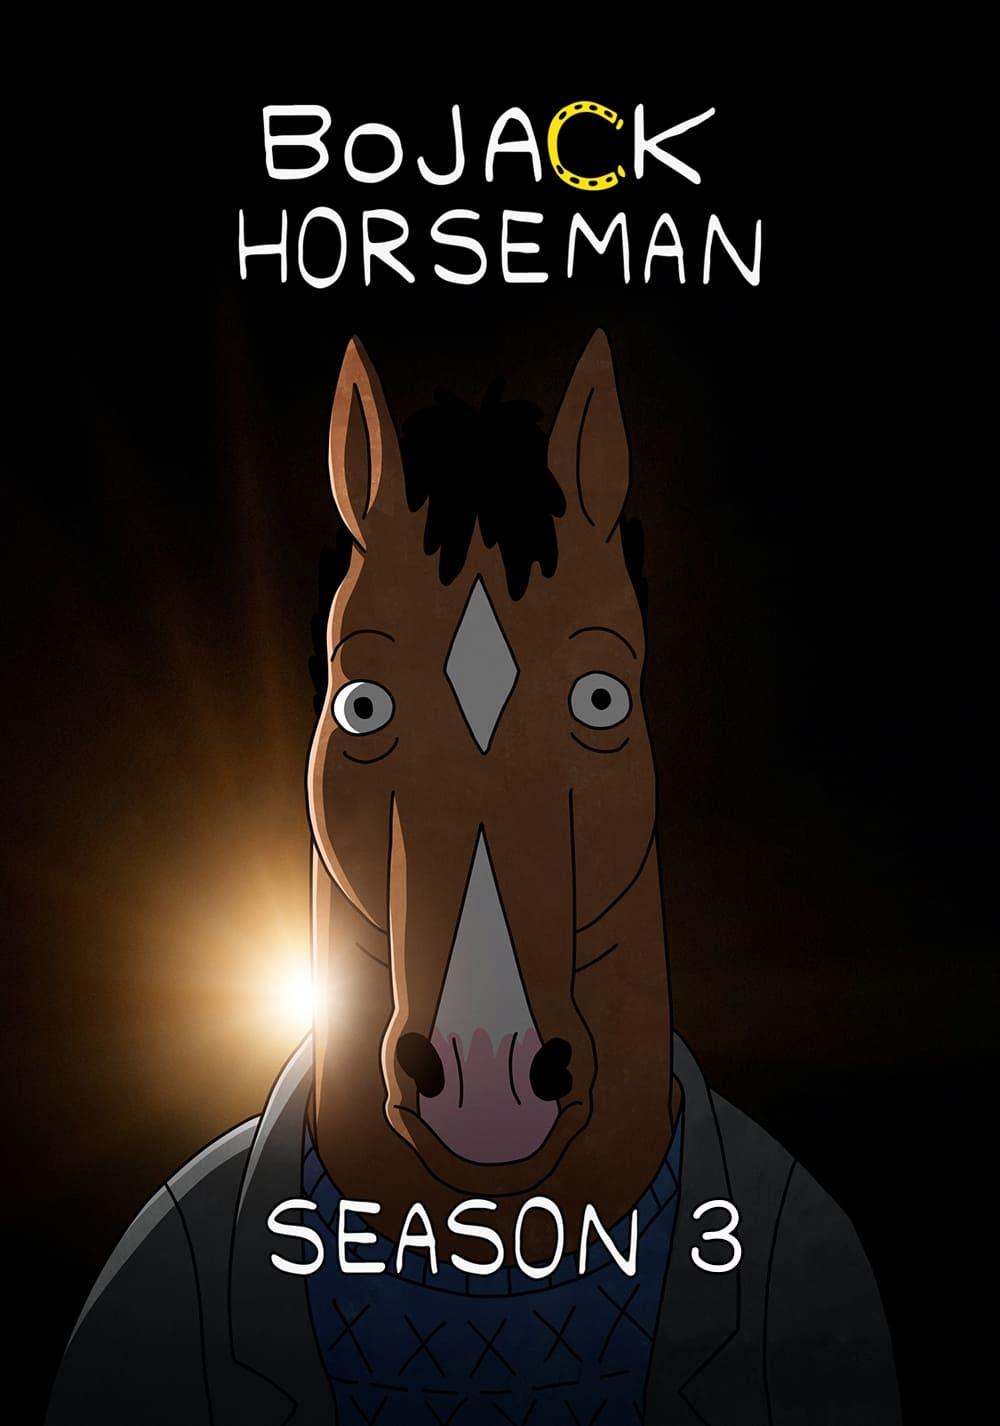 BoJack Horseman Season 3